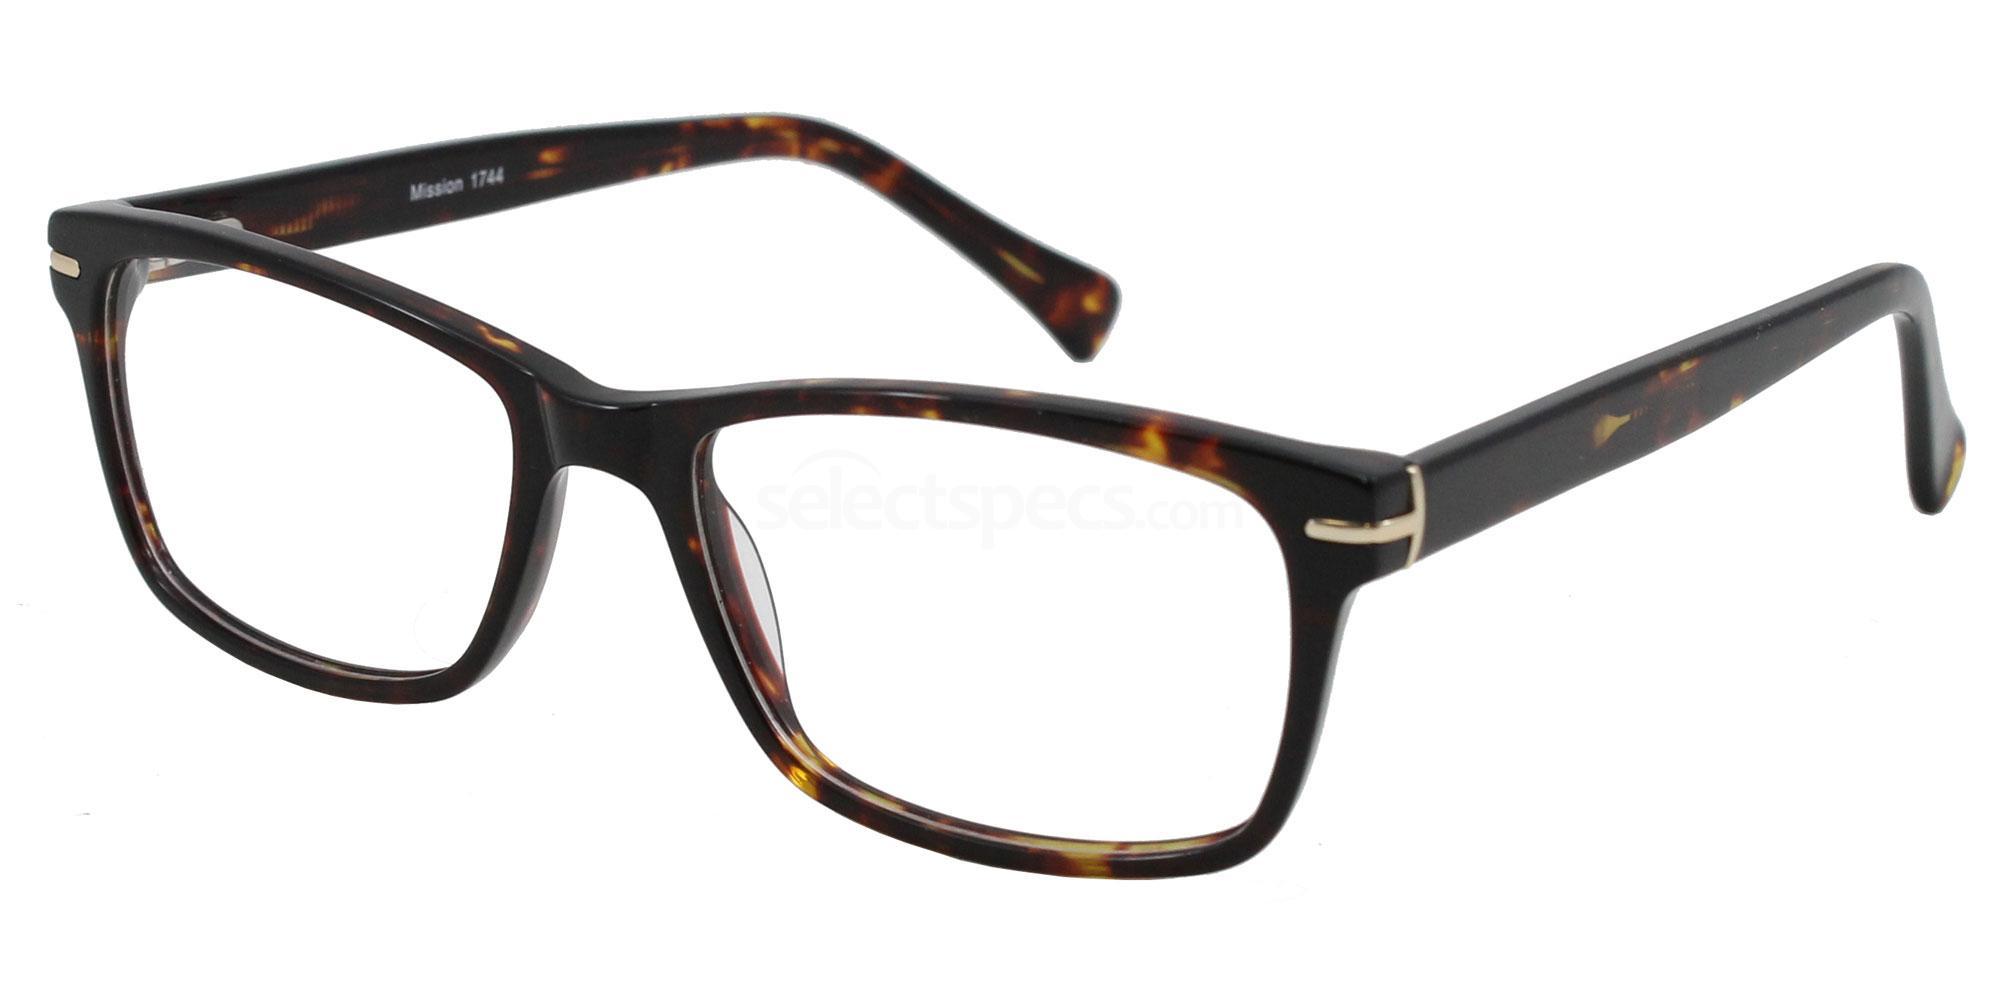 02 1744 Glasses, Mission